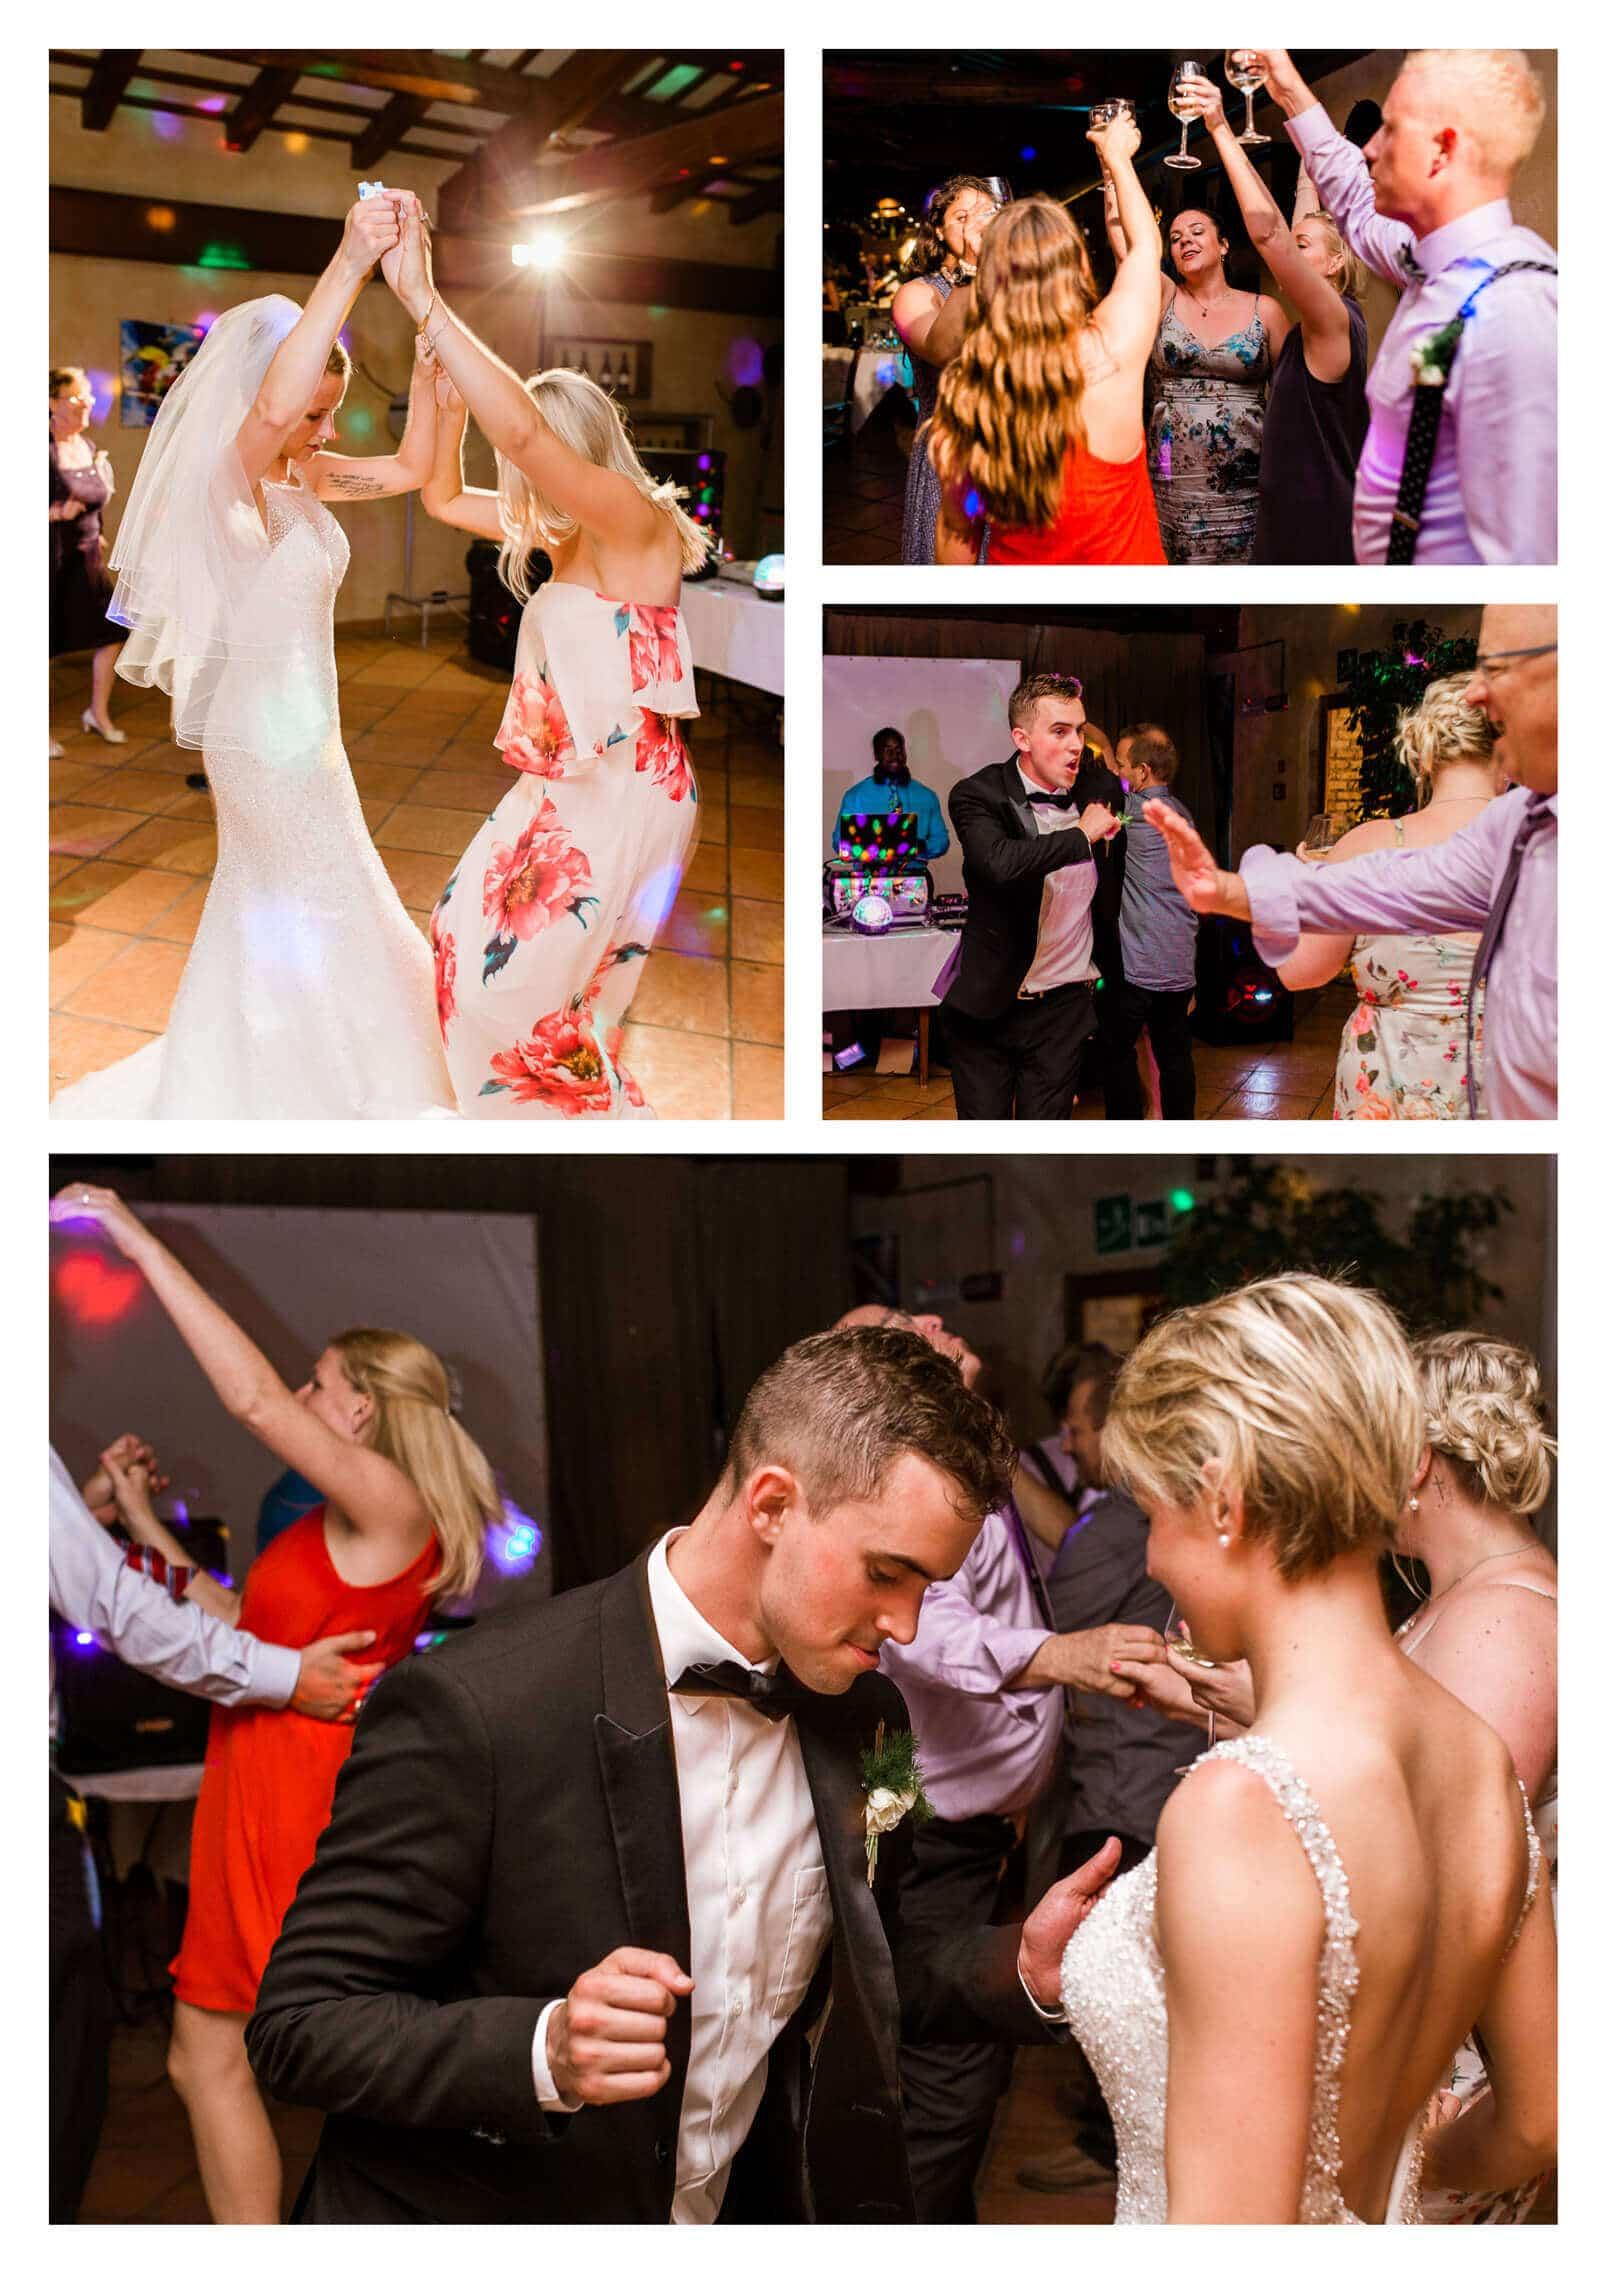 Reception dancing at Fossa Mala | Pordenone wedding photographer